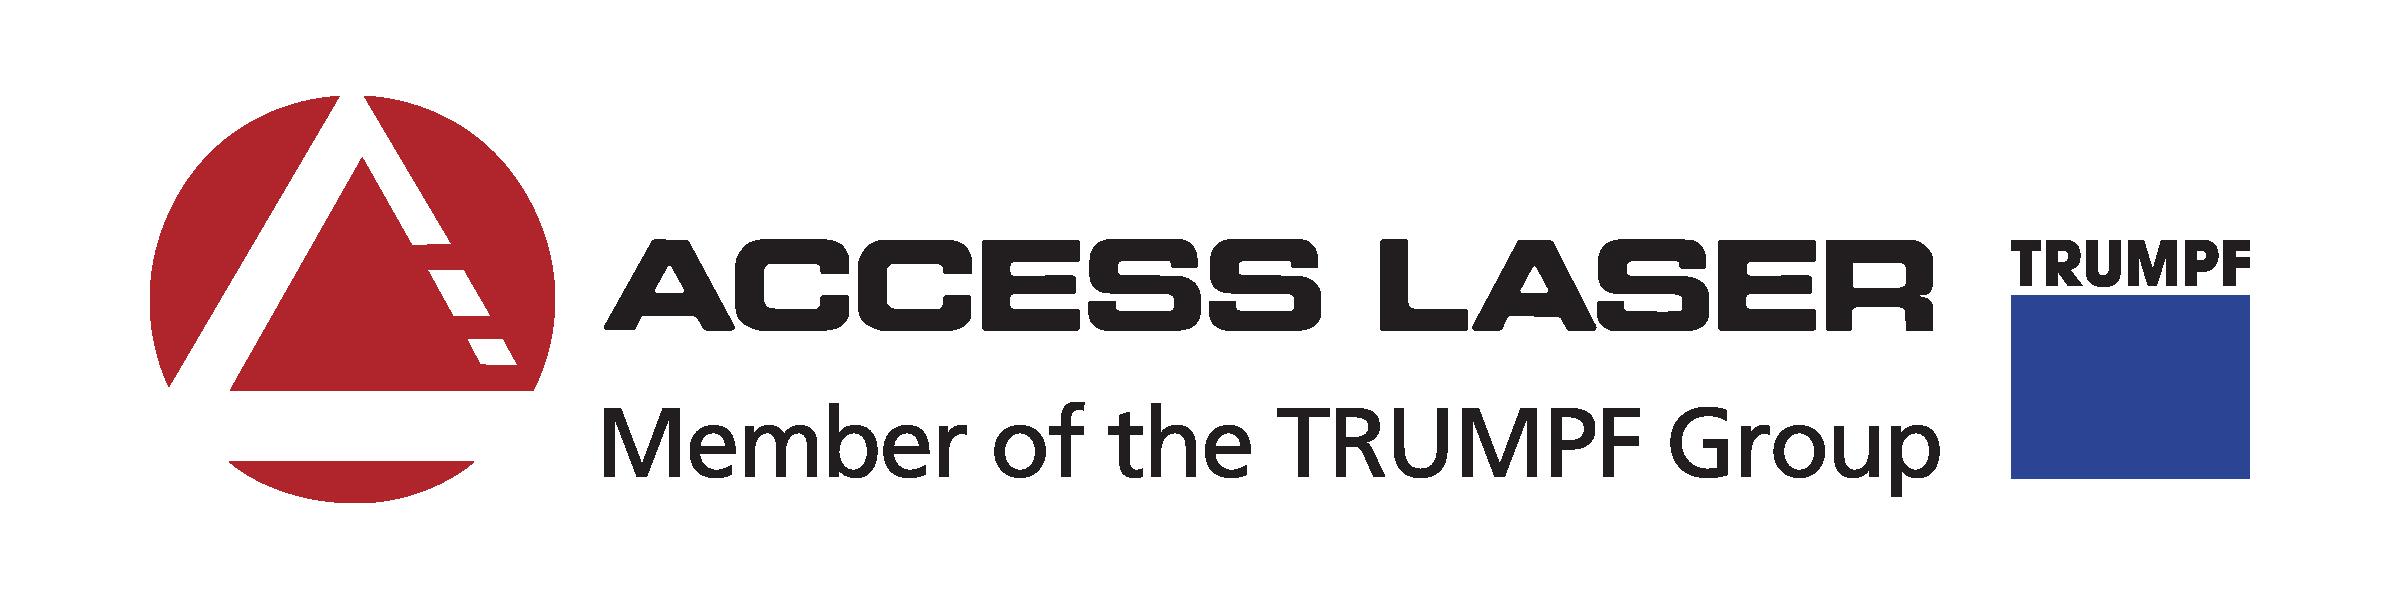 Access Laser